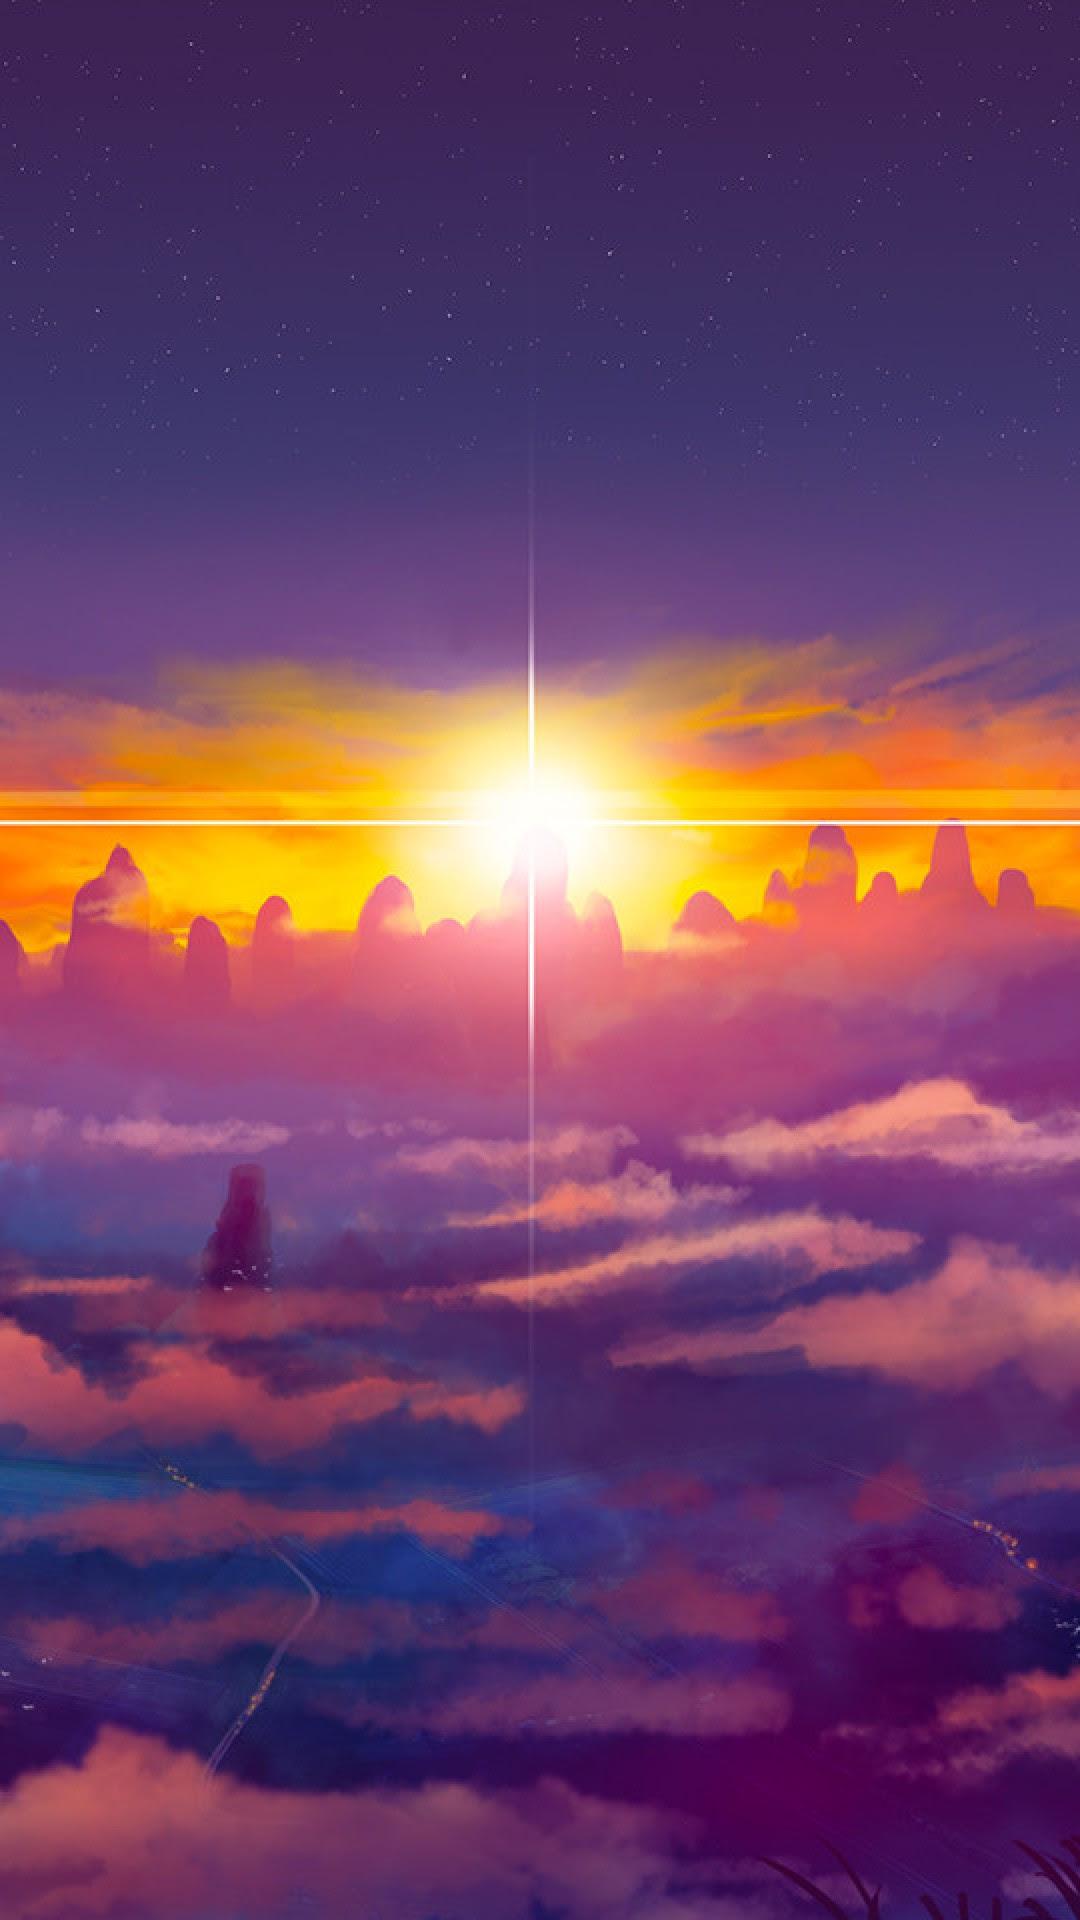 Anime Sunset HD Wallpaper iPhone 6 / 6S Plus - HD ...